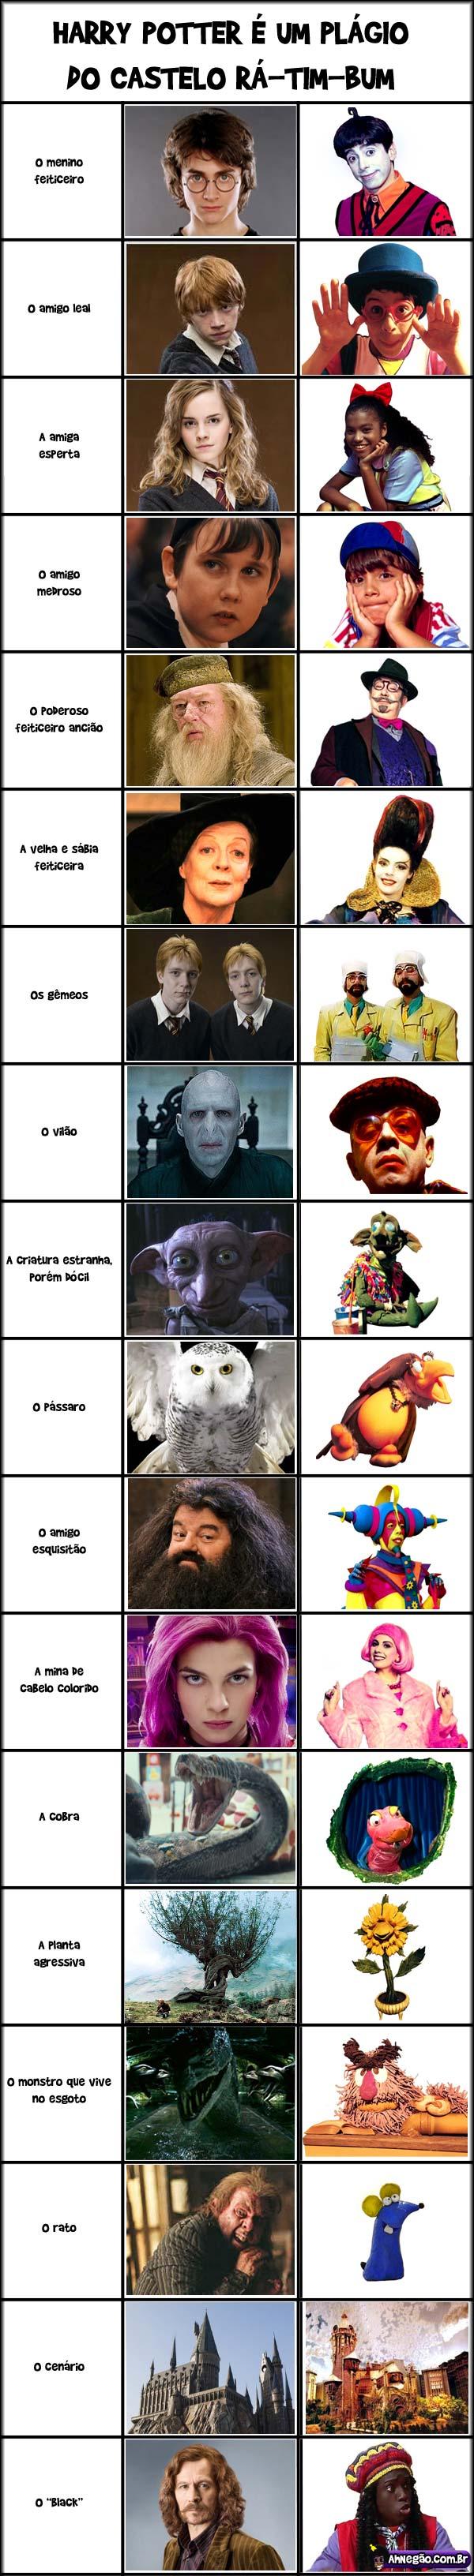 Bomba! Harry Potter é um plágio de Rá -Tim-Bum